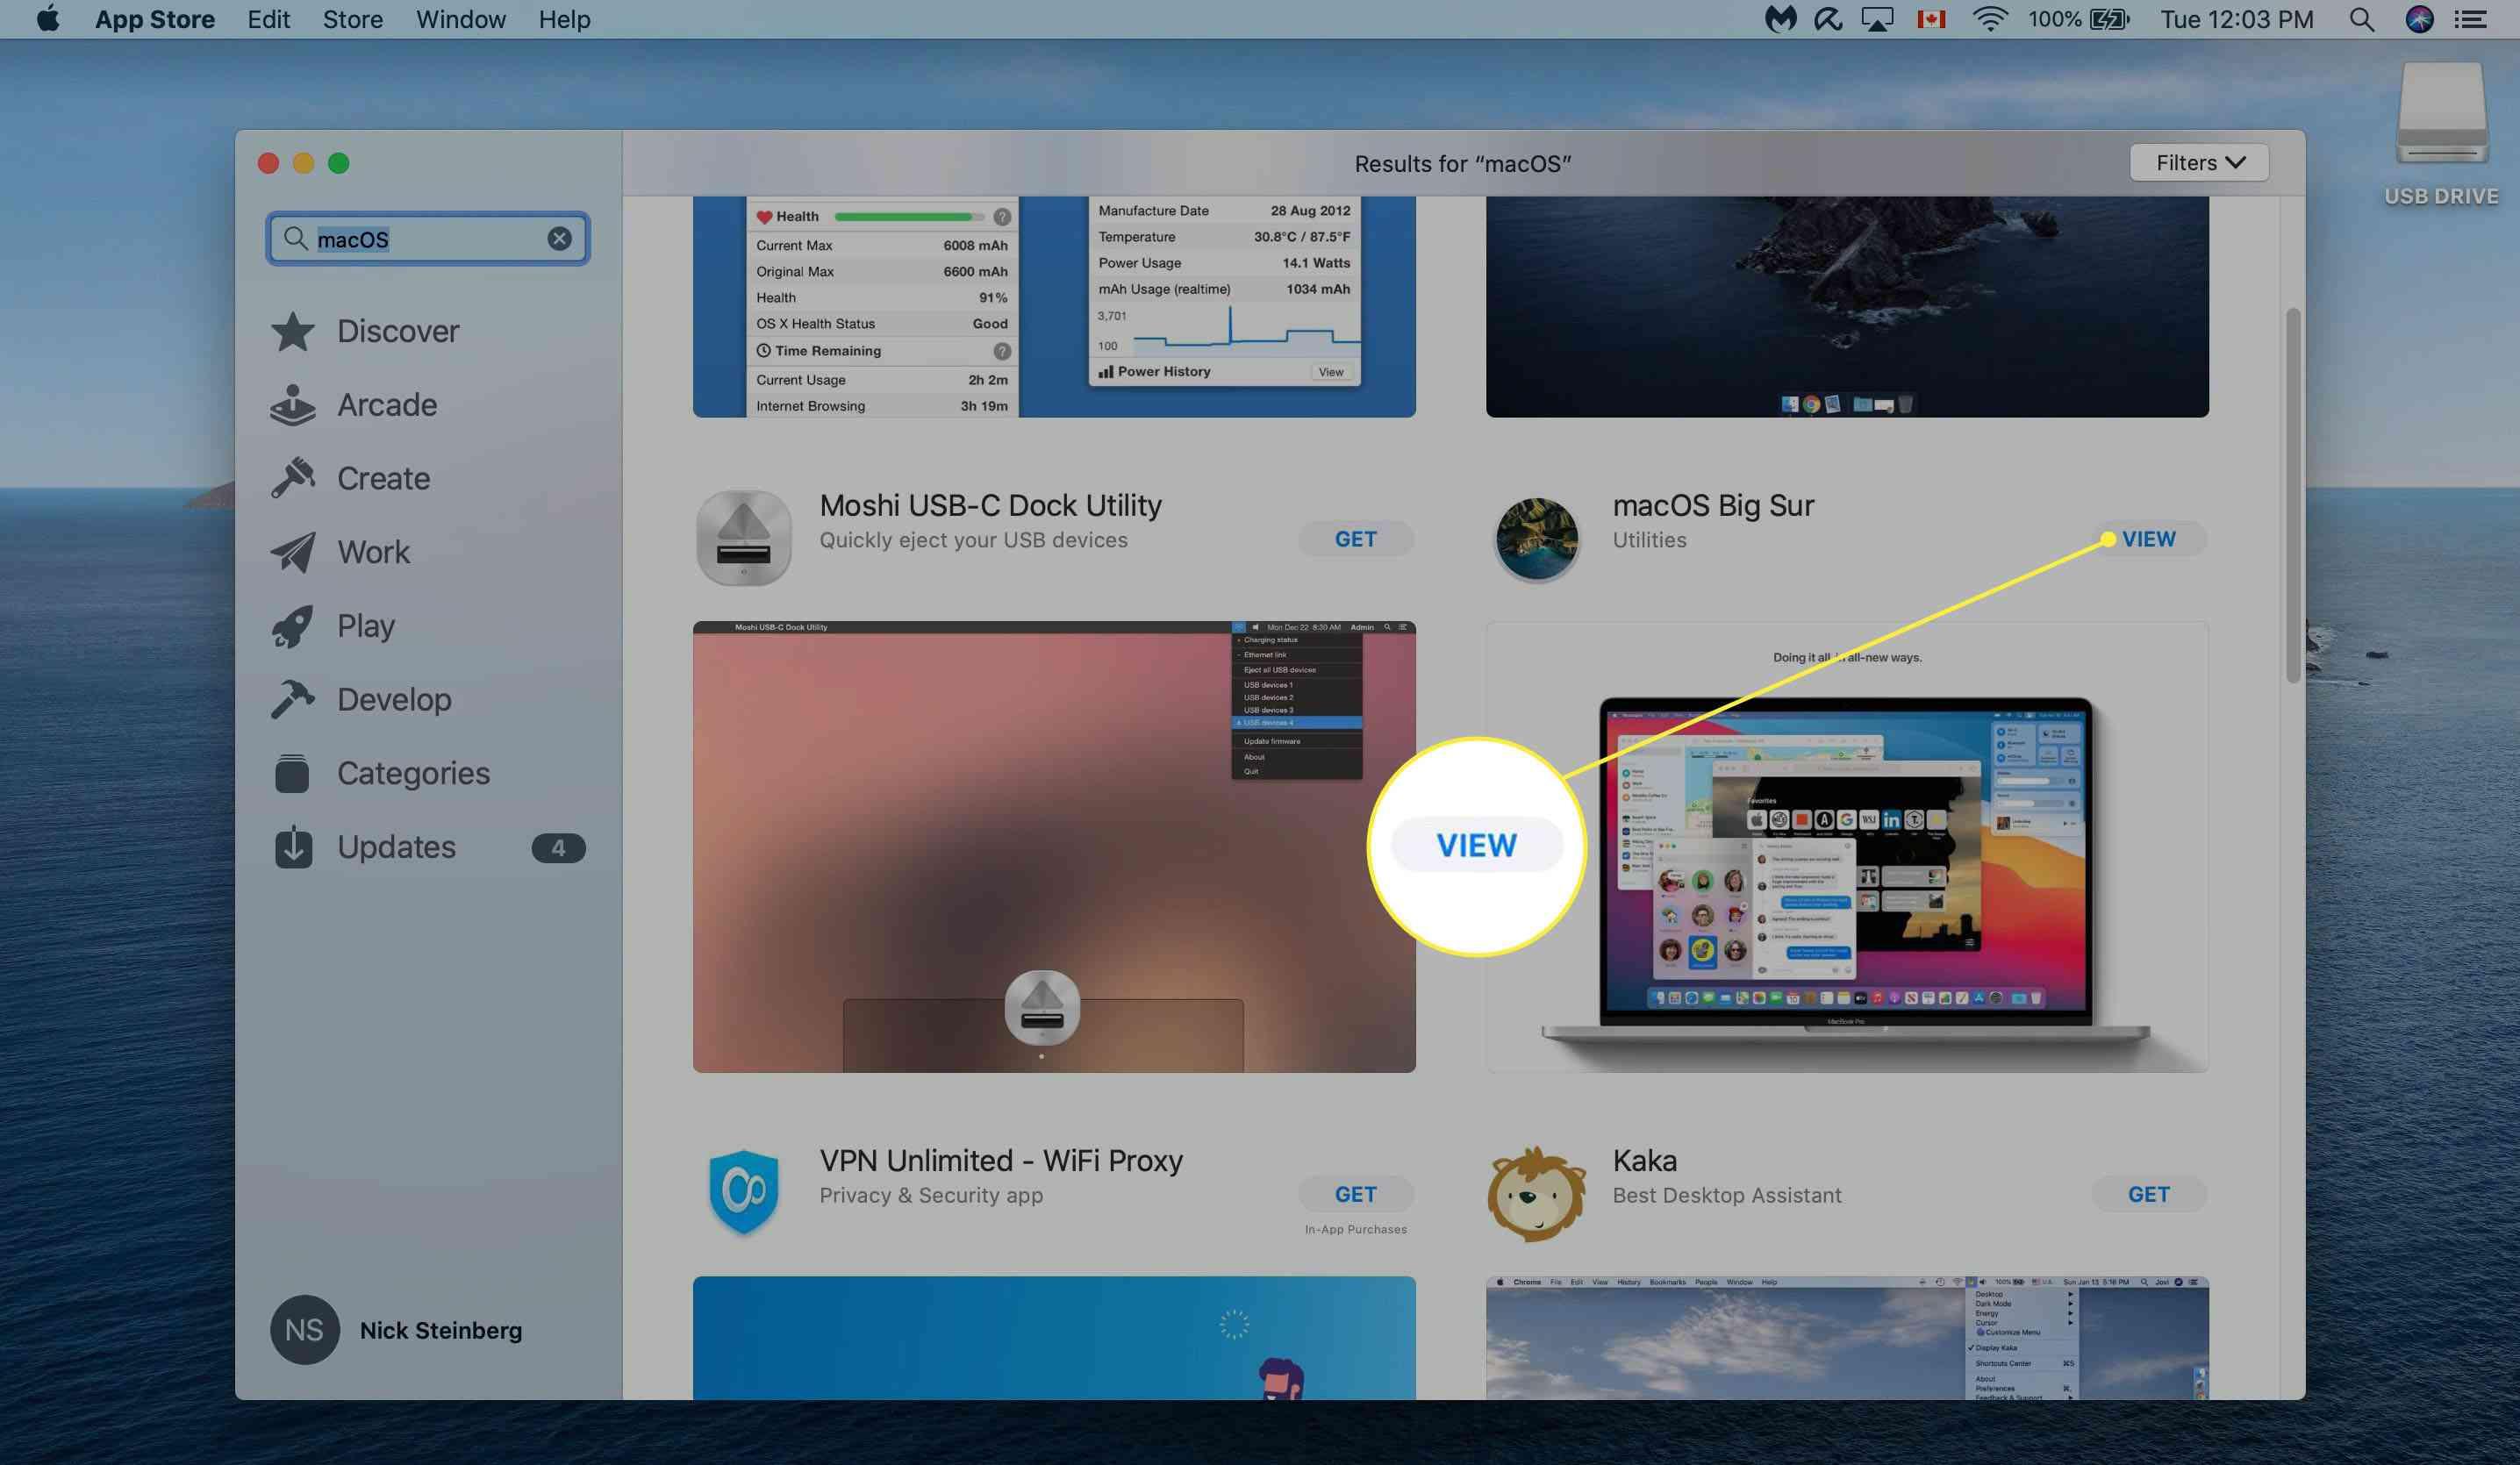 Locating macOS Big Sur in App Store.